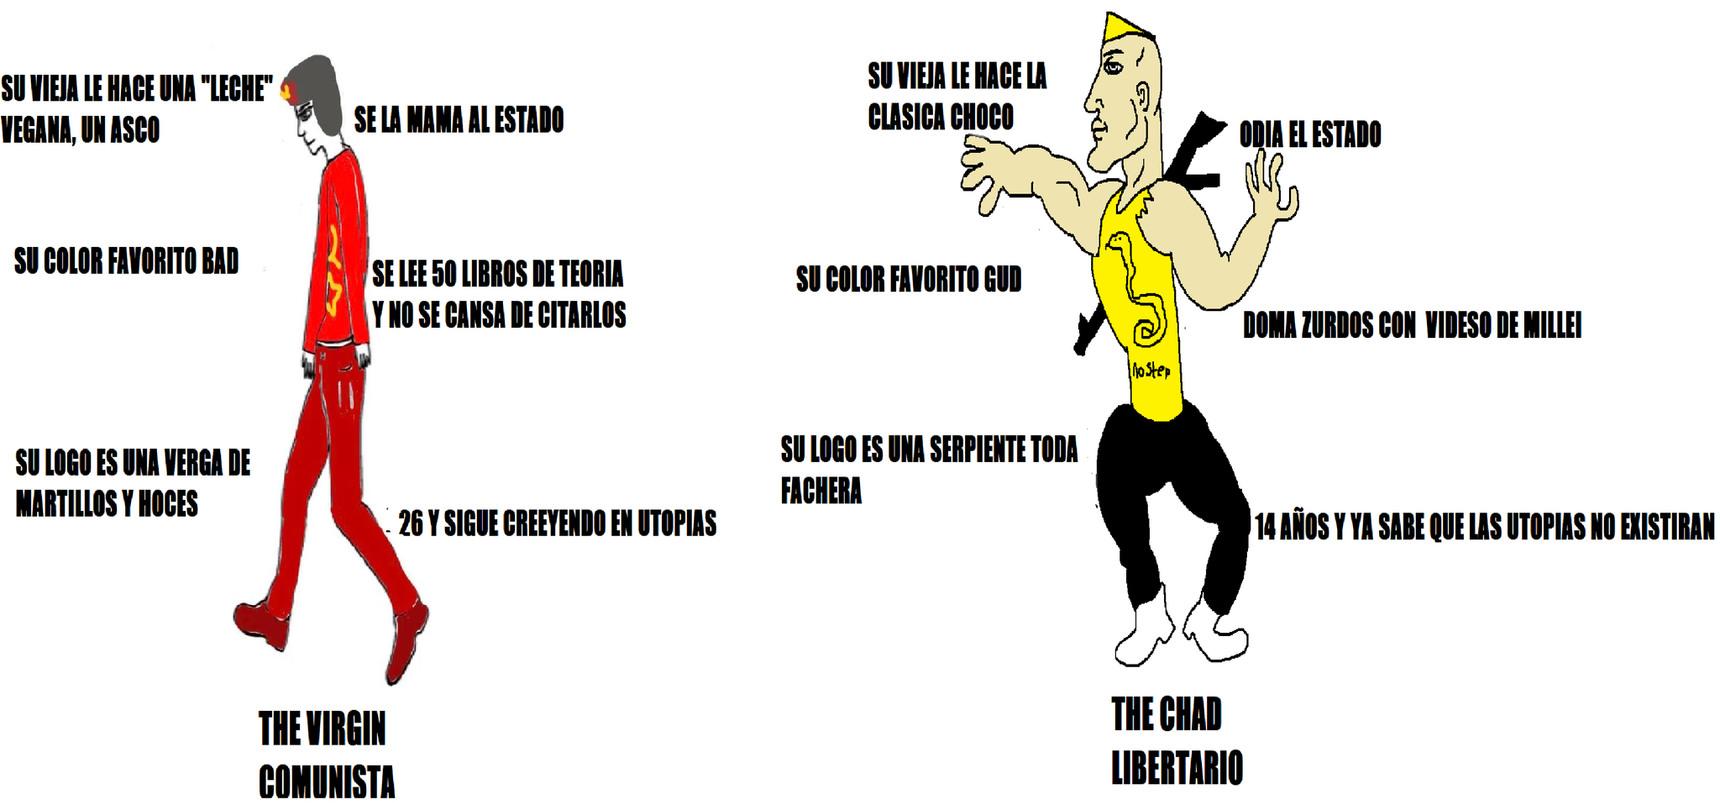 Comumierda vs Liberchad - meme